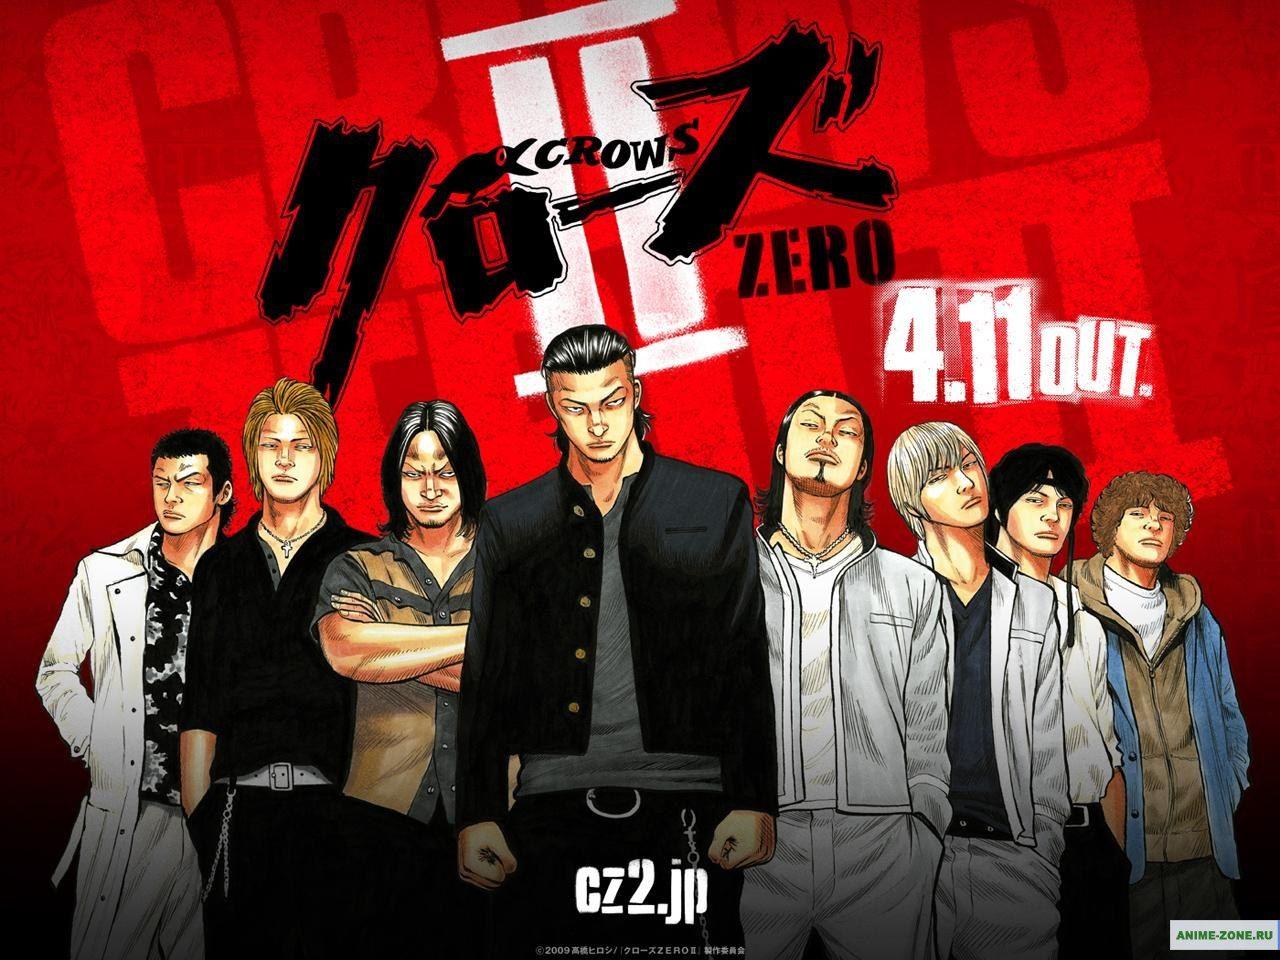 Crows Zero Wallpaper Desktop h781413 Movies HD